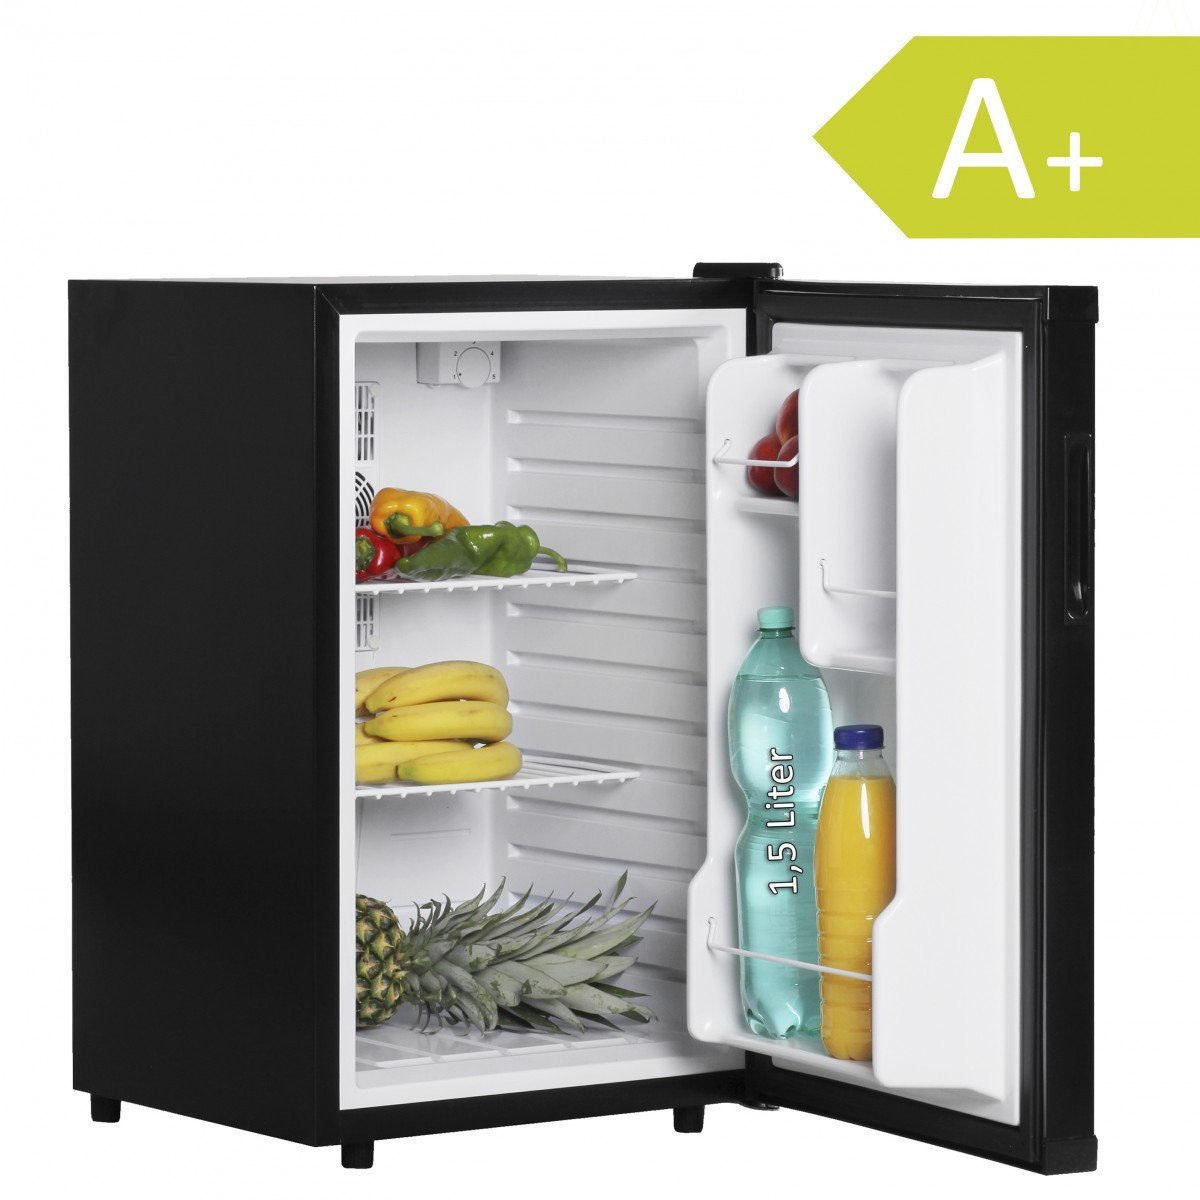 Mini-Kühlschränke | Amazon.de | {Minikühlschränke 29}